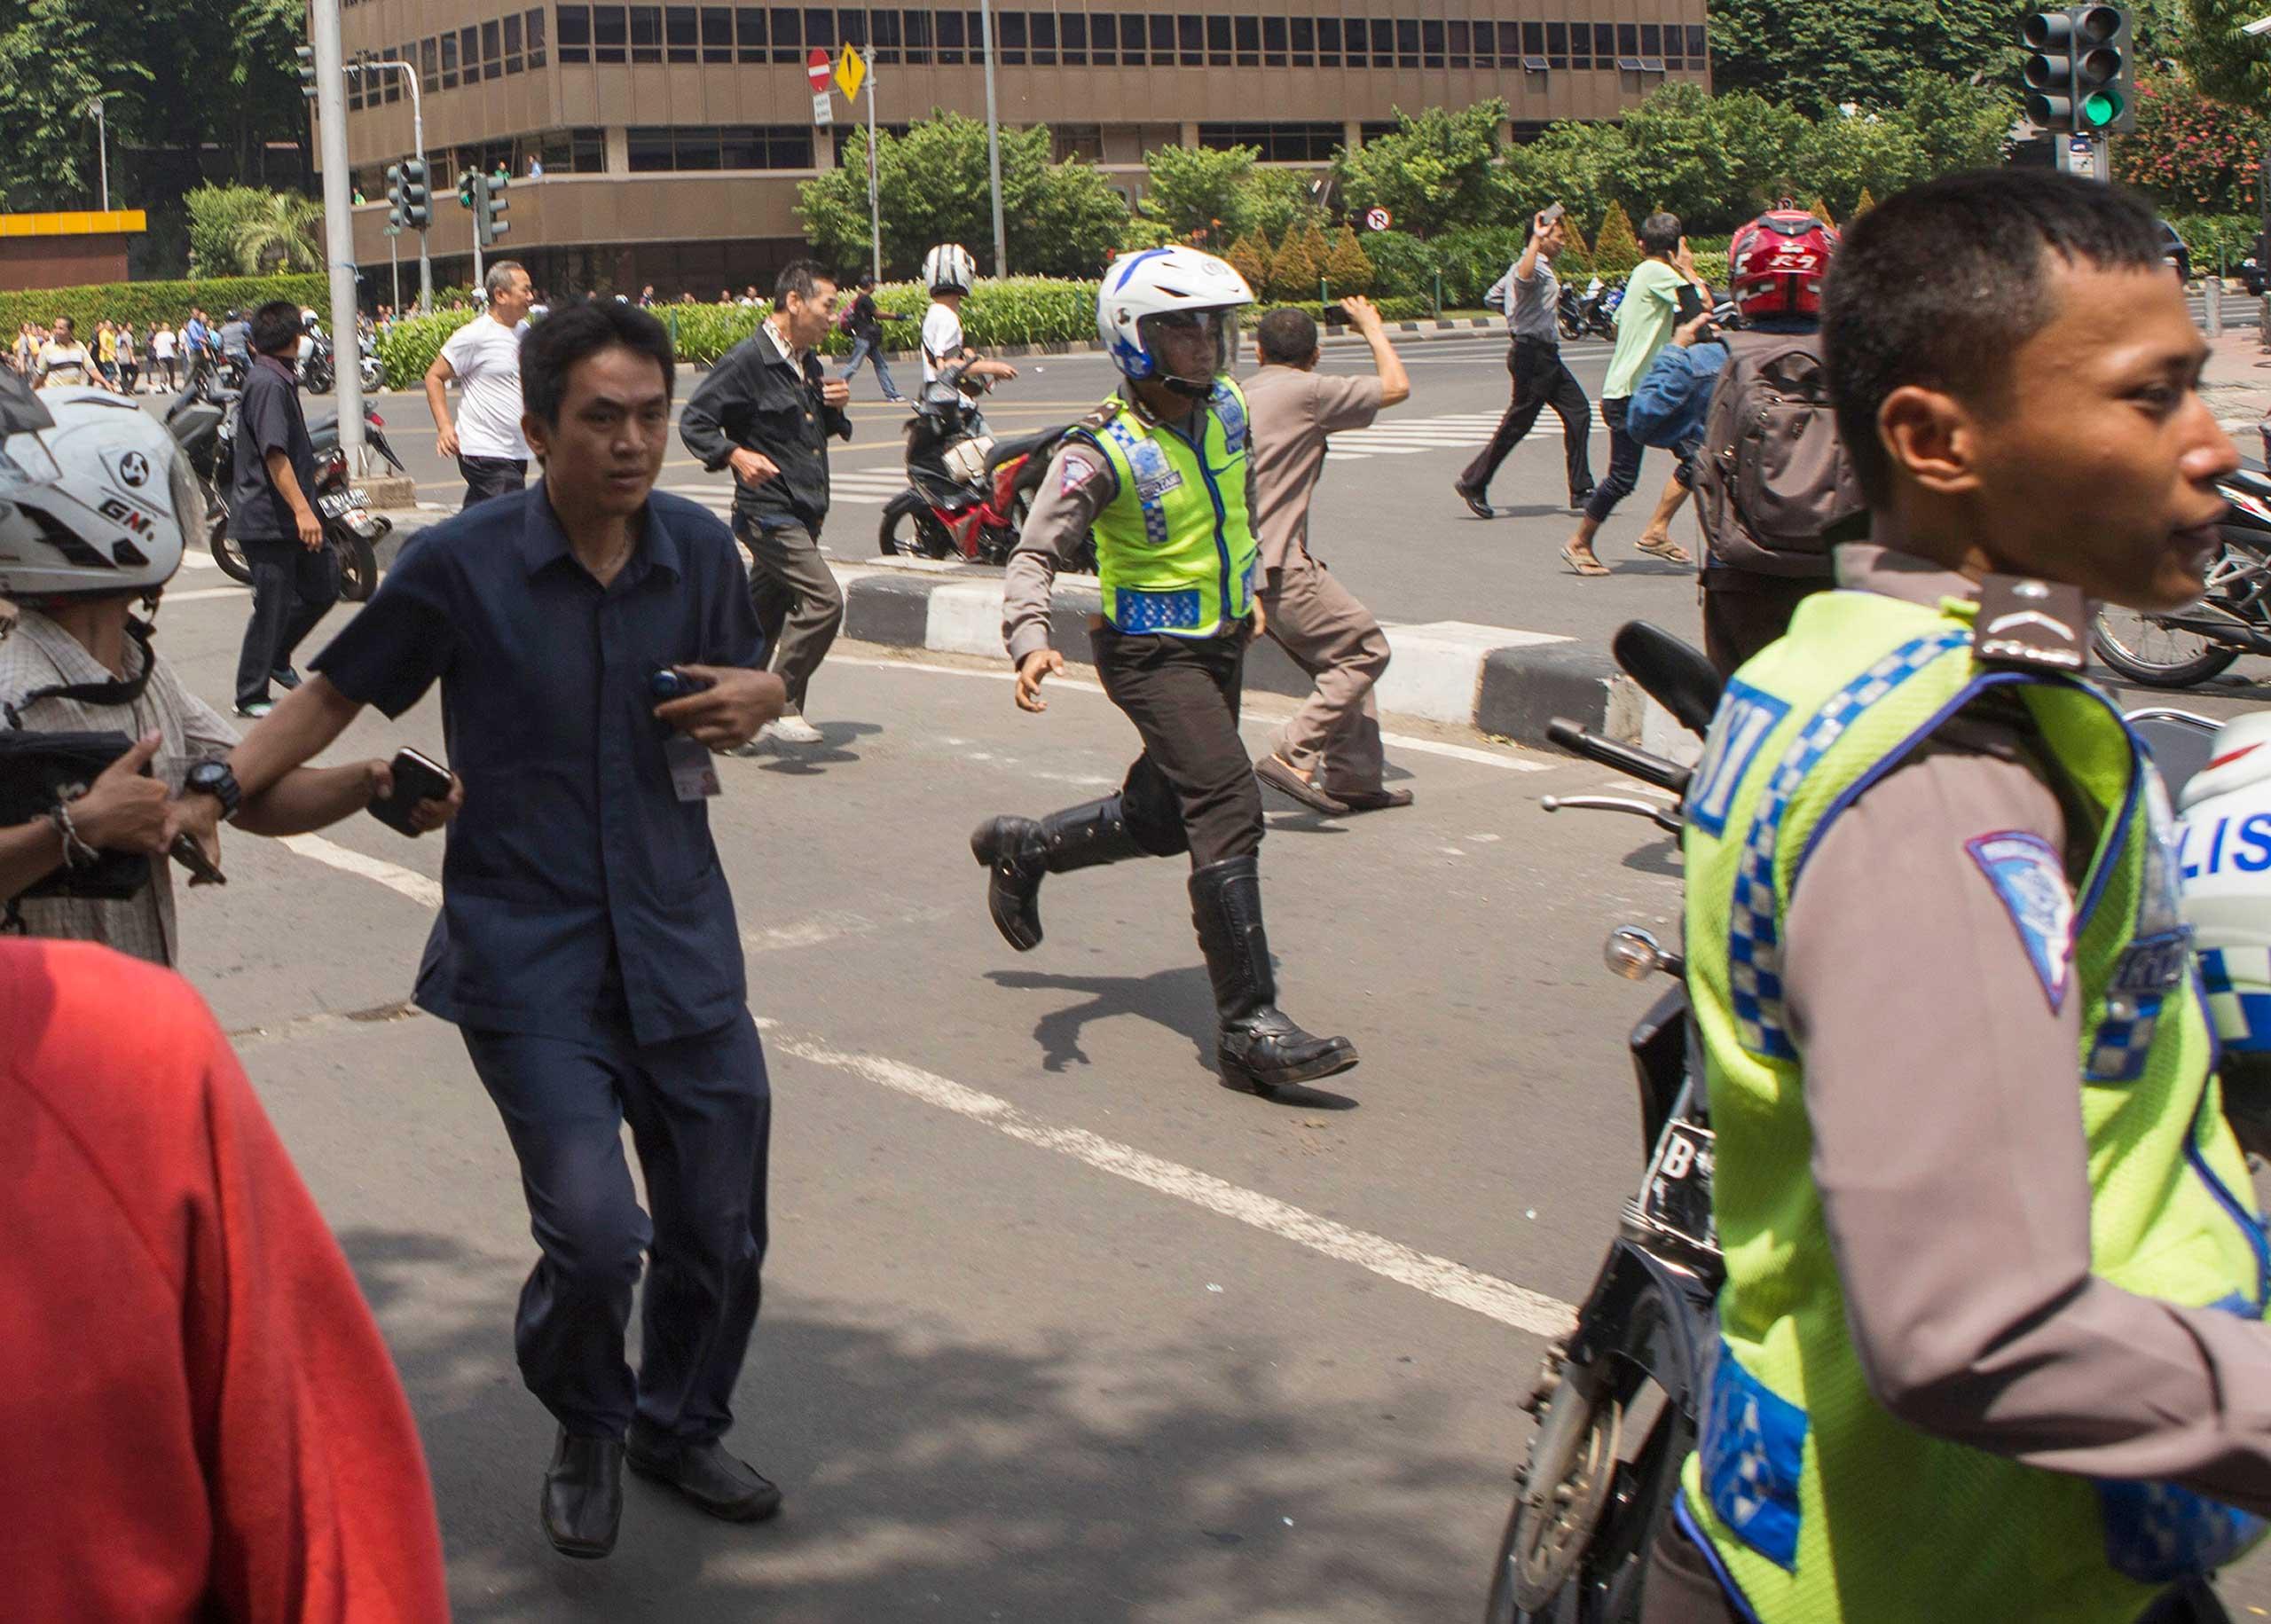 People flee from the scene after a gun battle broke out following an explosion in Jakarta, Indonesia, Jan. 14, 2016.